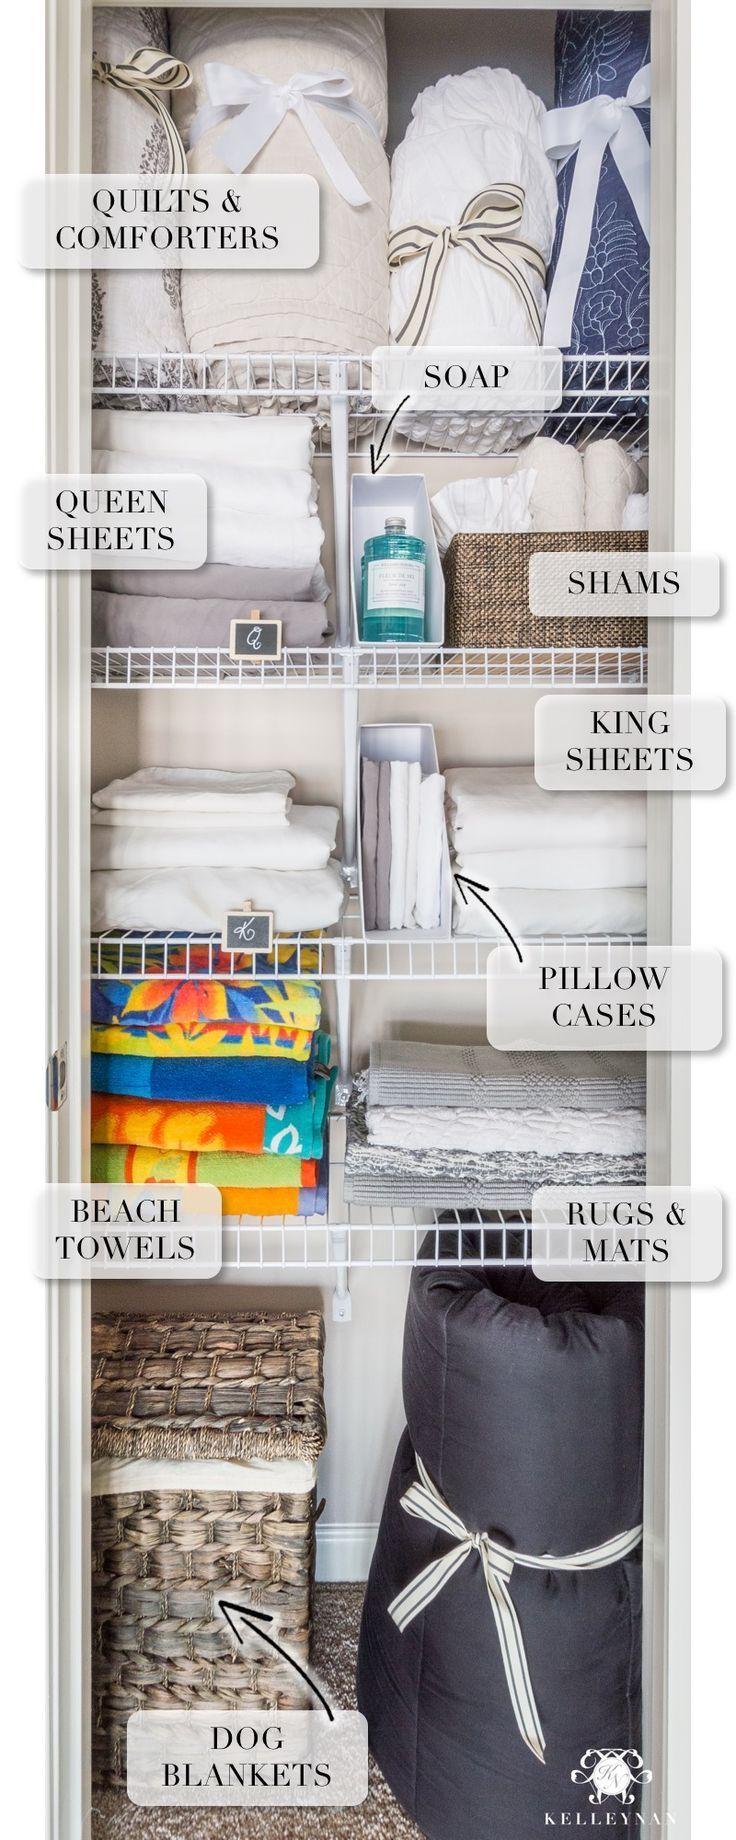 Kelley Nan: A Small Organized Linen Closet (And Ideas to Store Bulky Bedding) #organization #linencloset #organized